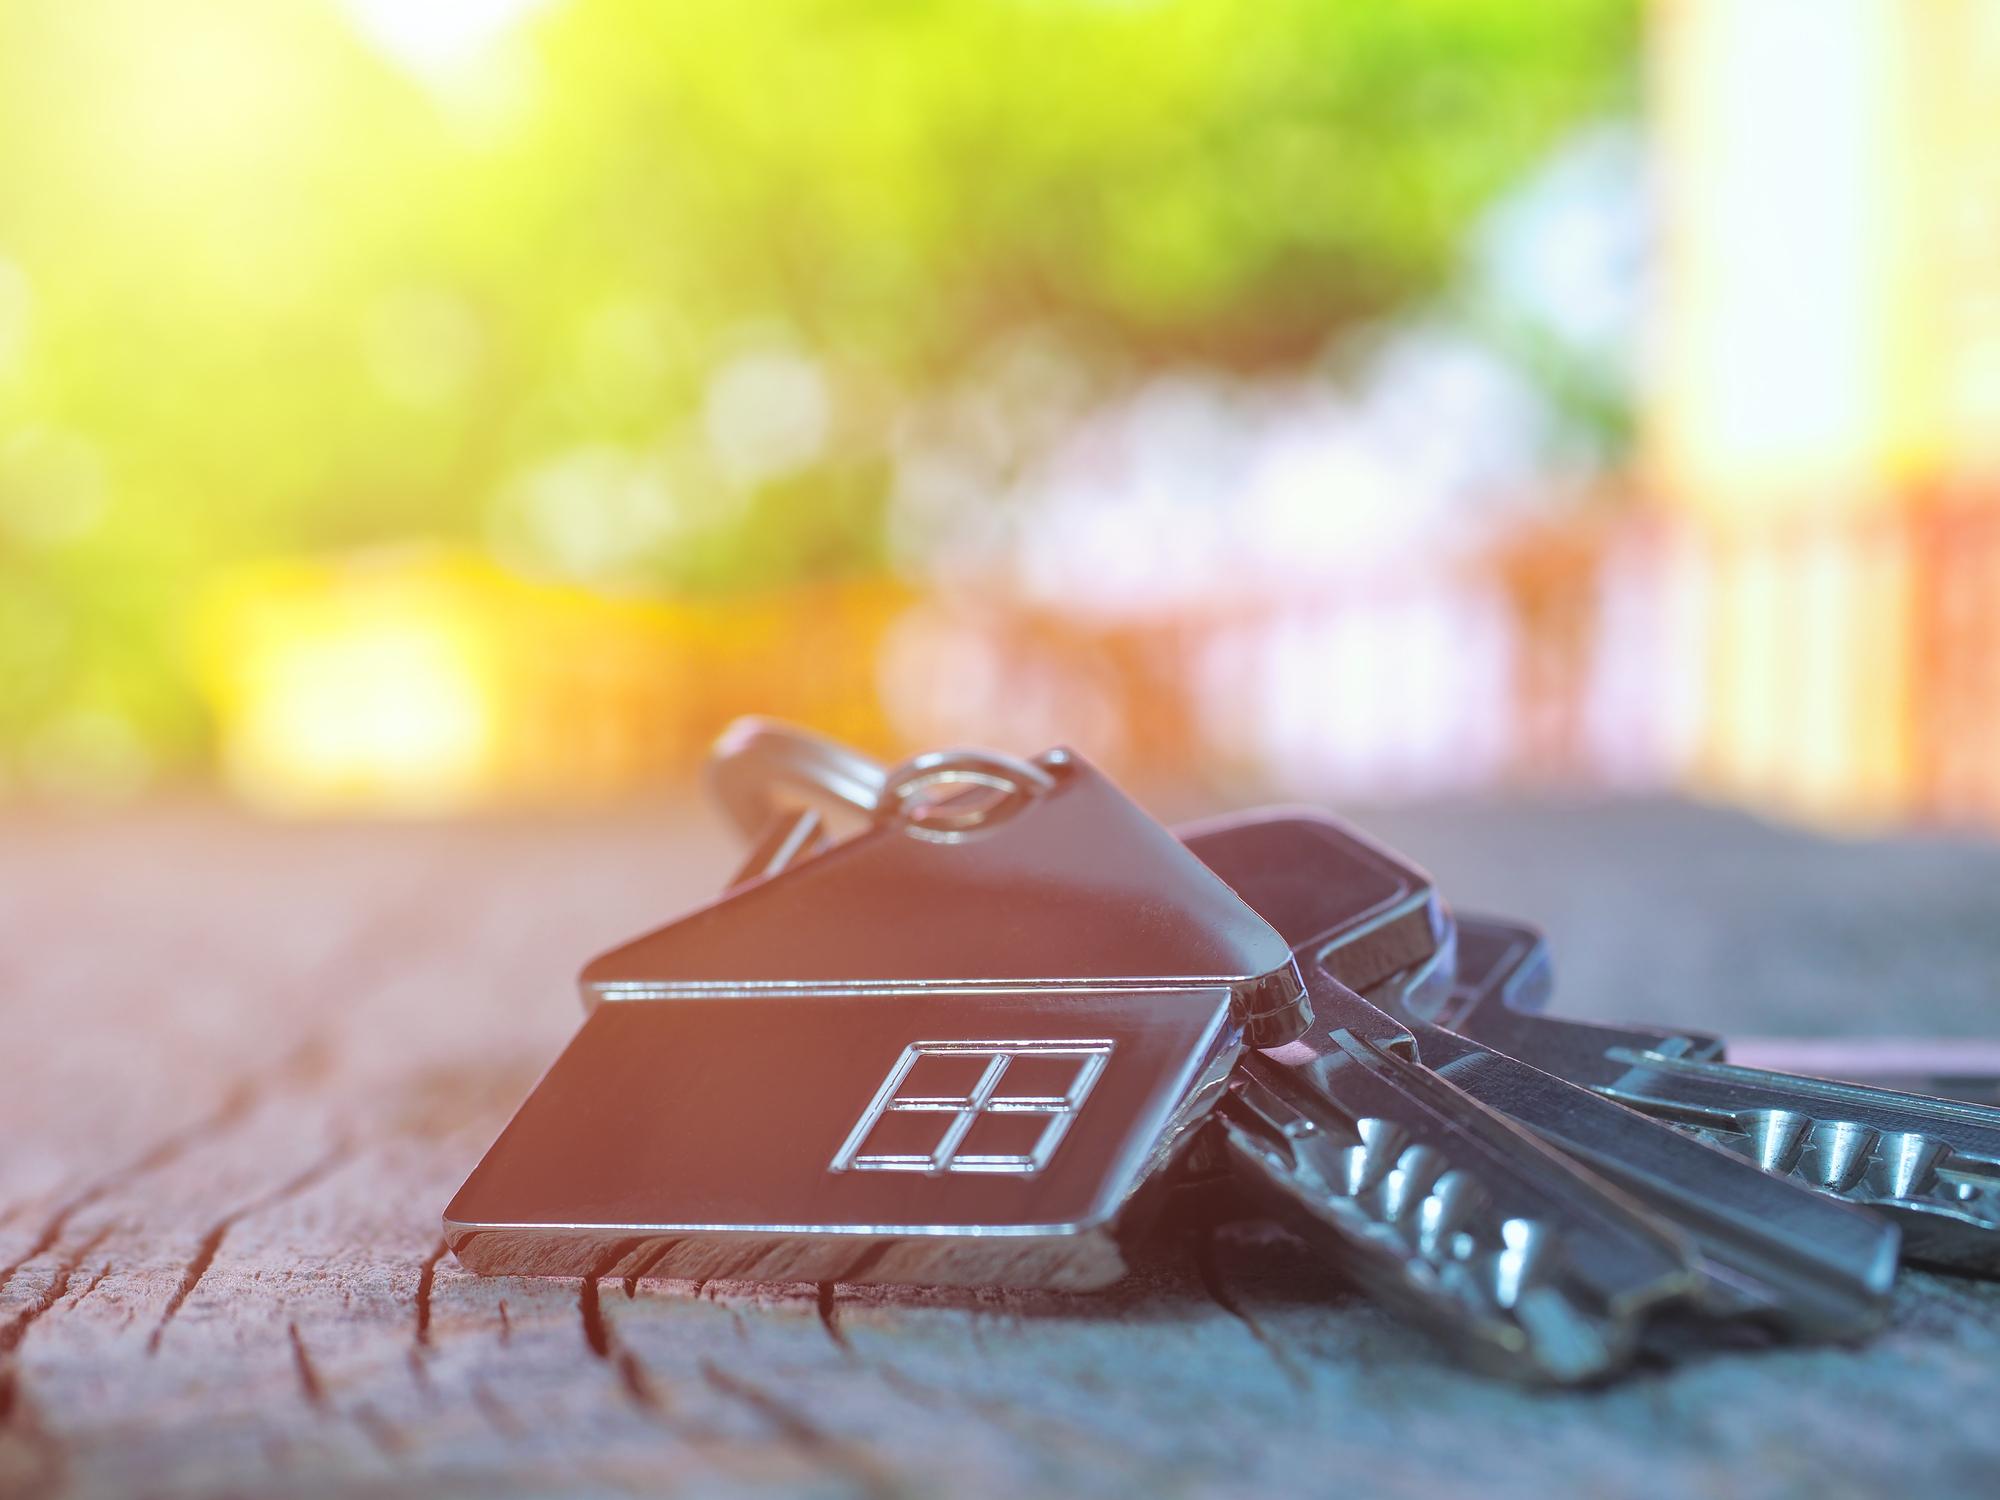 Georgia Initiative for Community Housing touts success, partnerships, solutions